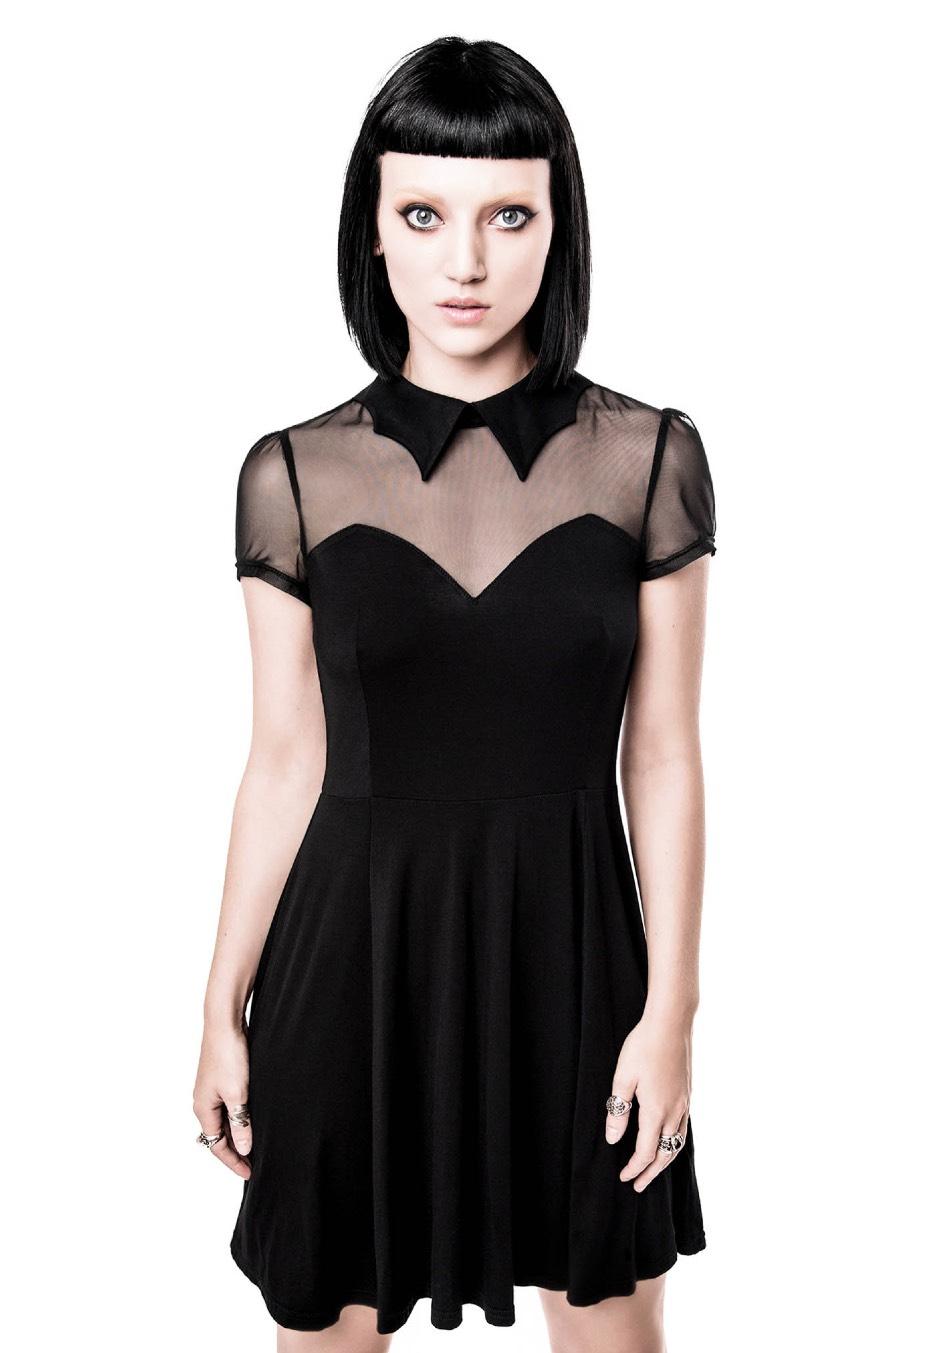 d201a6a27e Killstar - Vampyra Skater Black - Dress - Streetwear Shop - Impericon.com AU